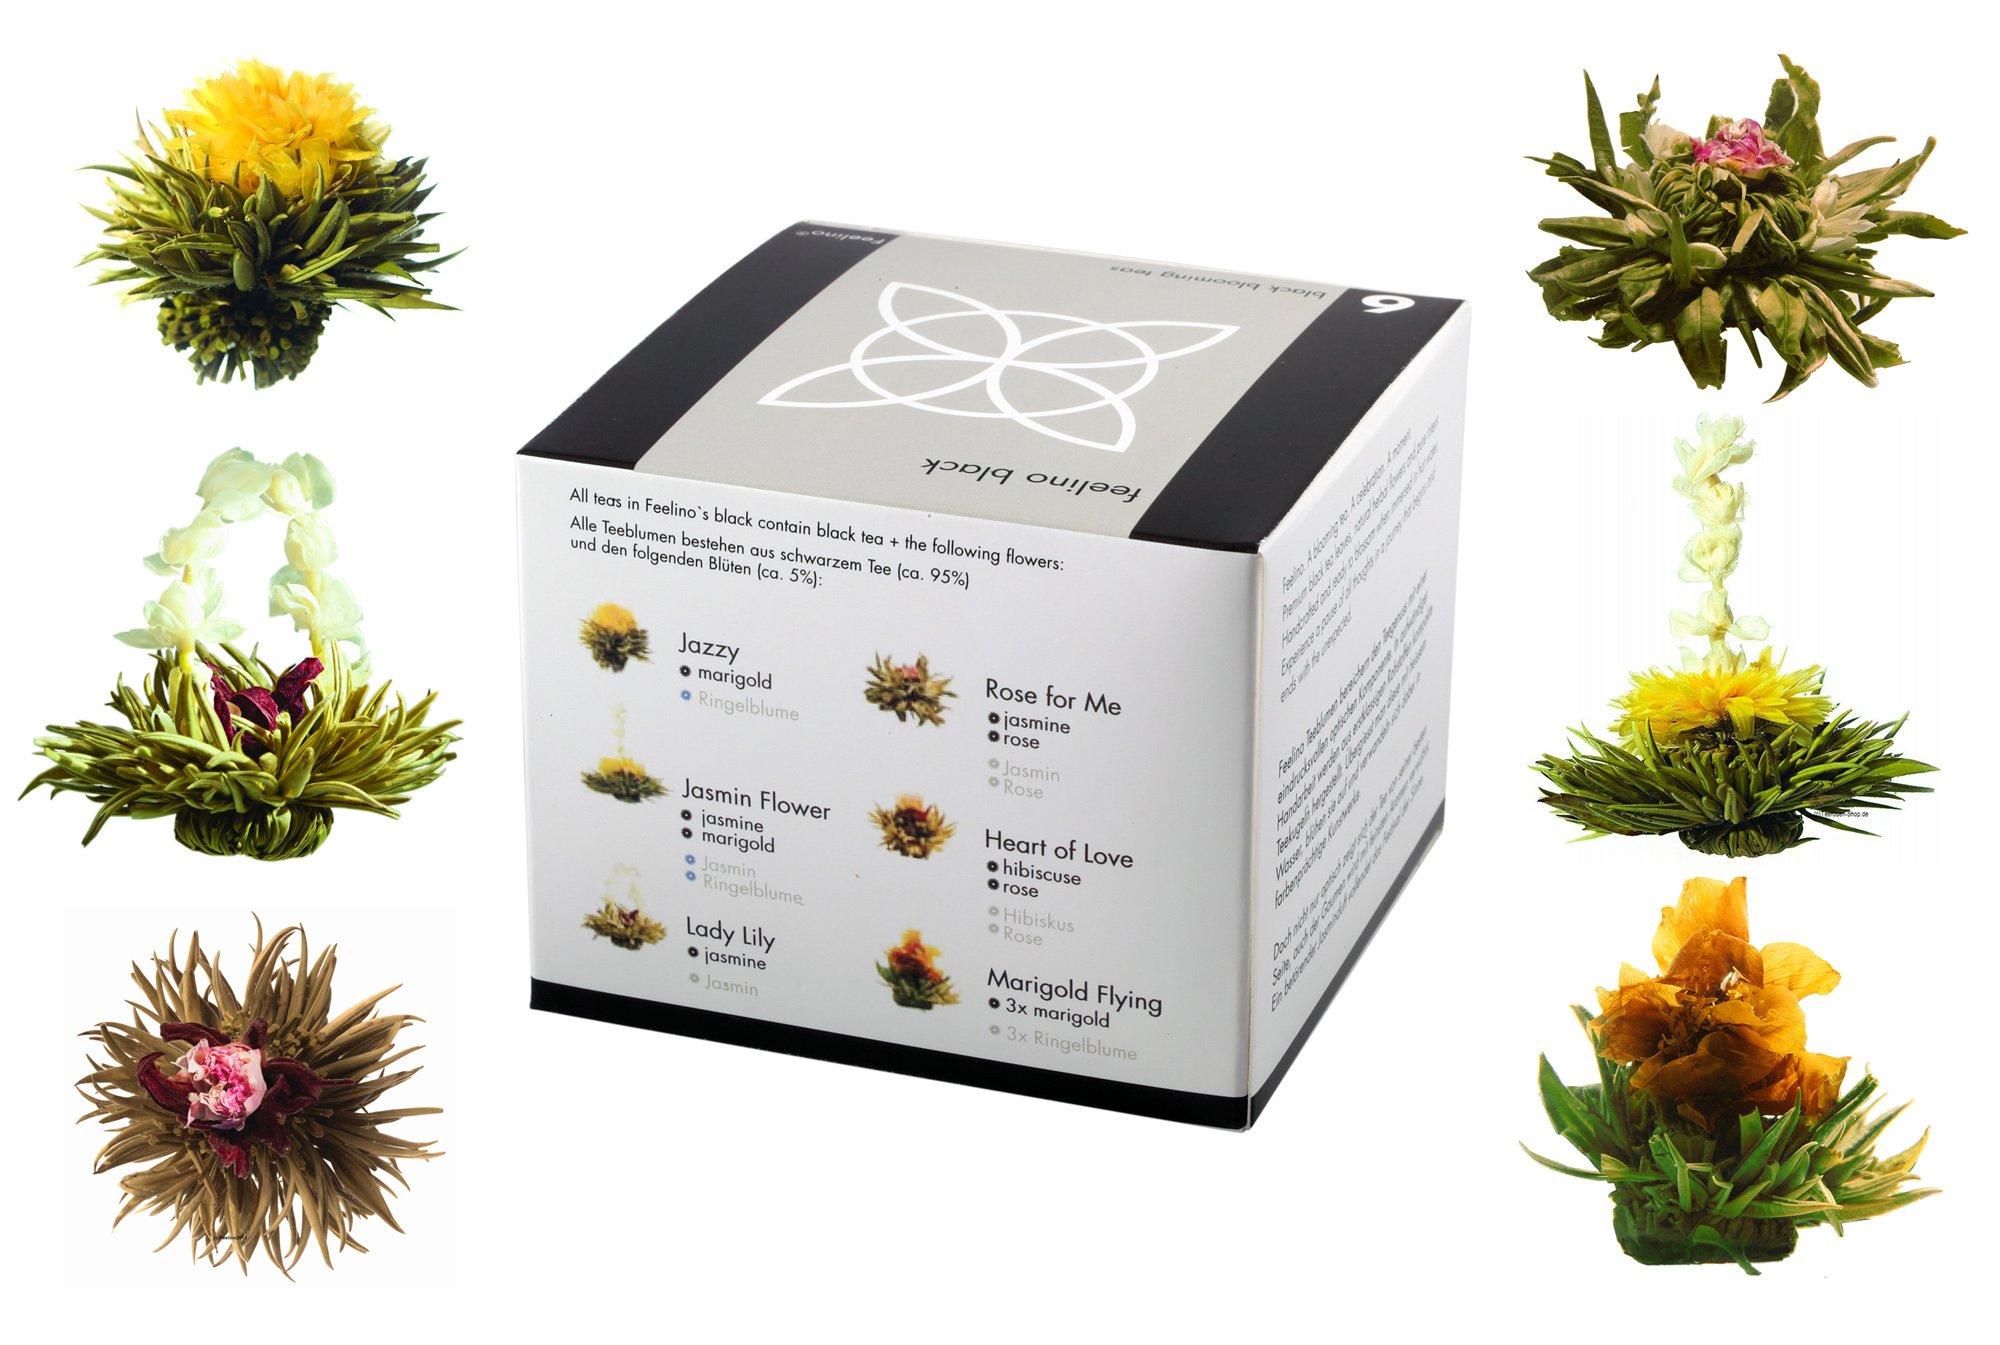 Feelino-Edle-6er-Mischbox-Schwarztee-Teeblumen-black-in-toller-Probier-und-Geschenkbox-mit-6-verschiedenen-Teerosen-1er-Pack